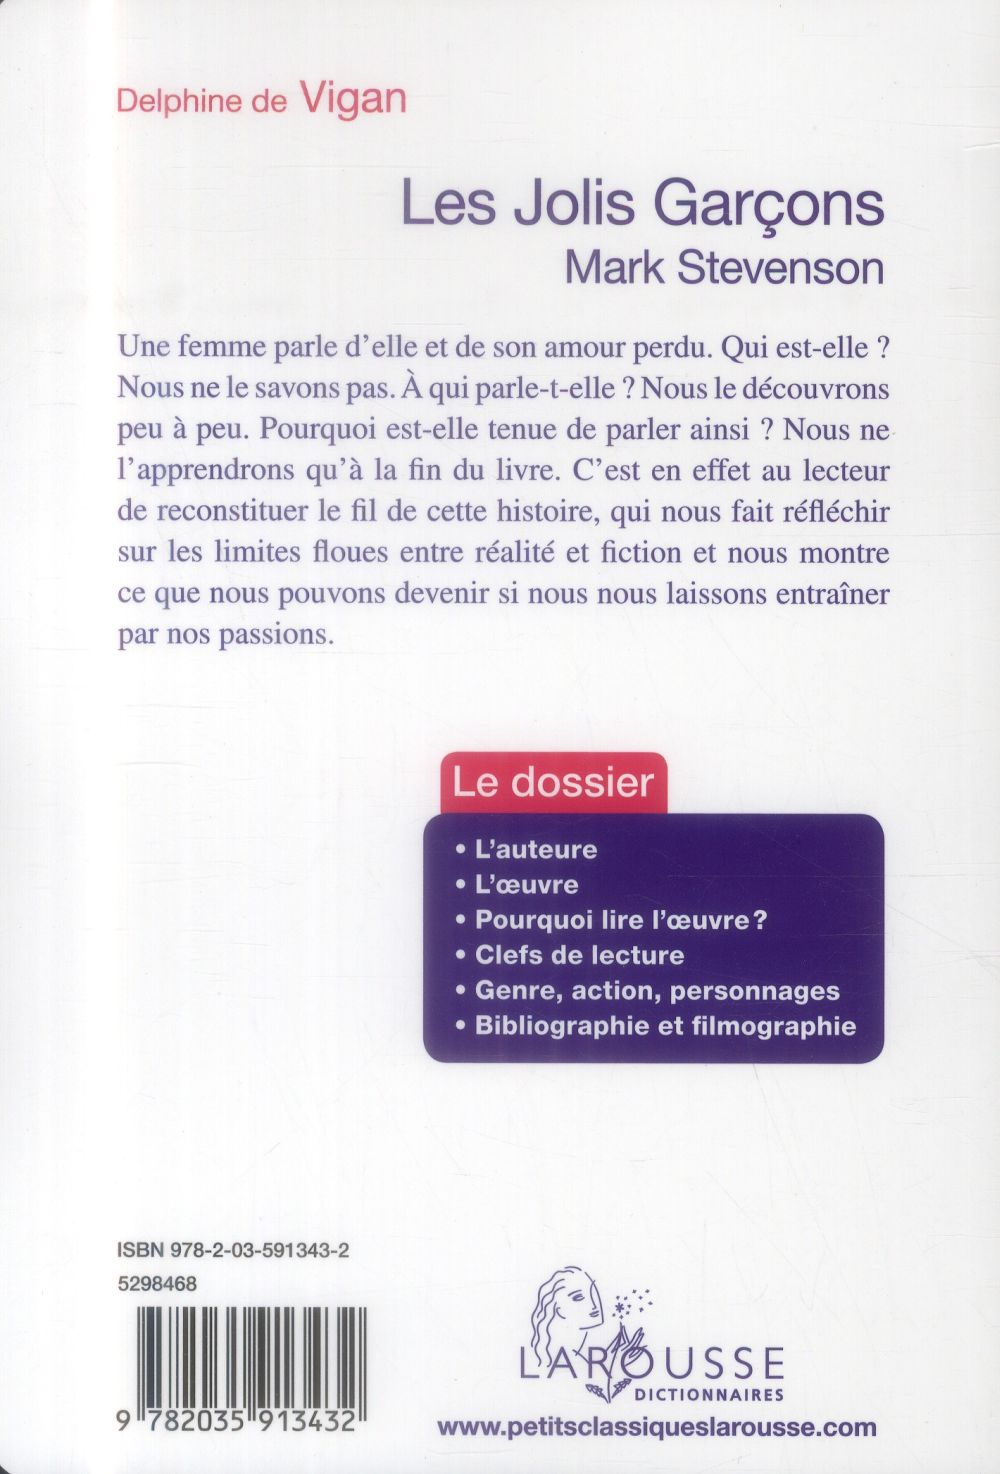 Les jolis garçons ; Mark Stevenson